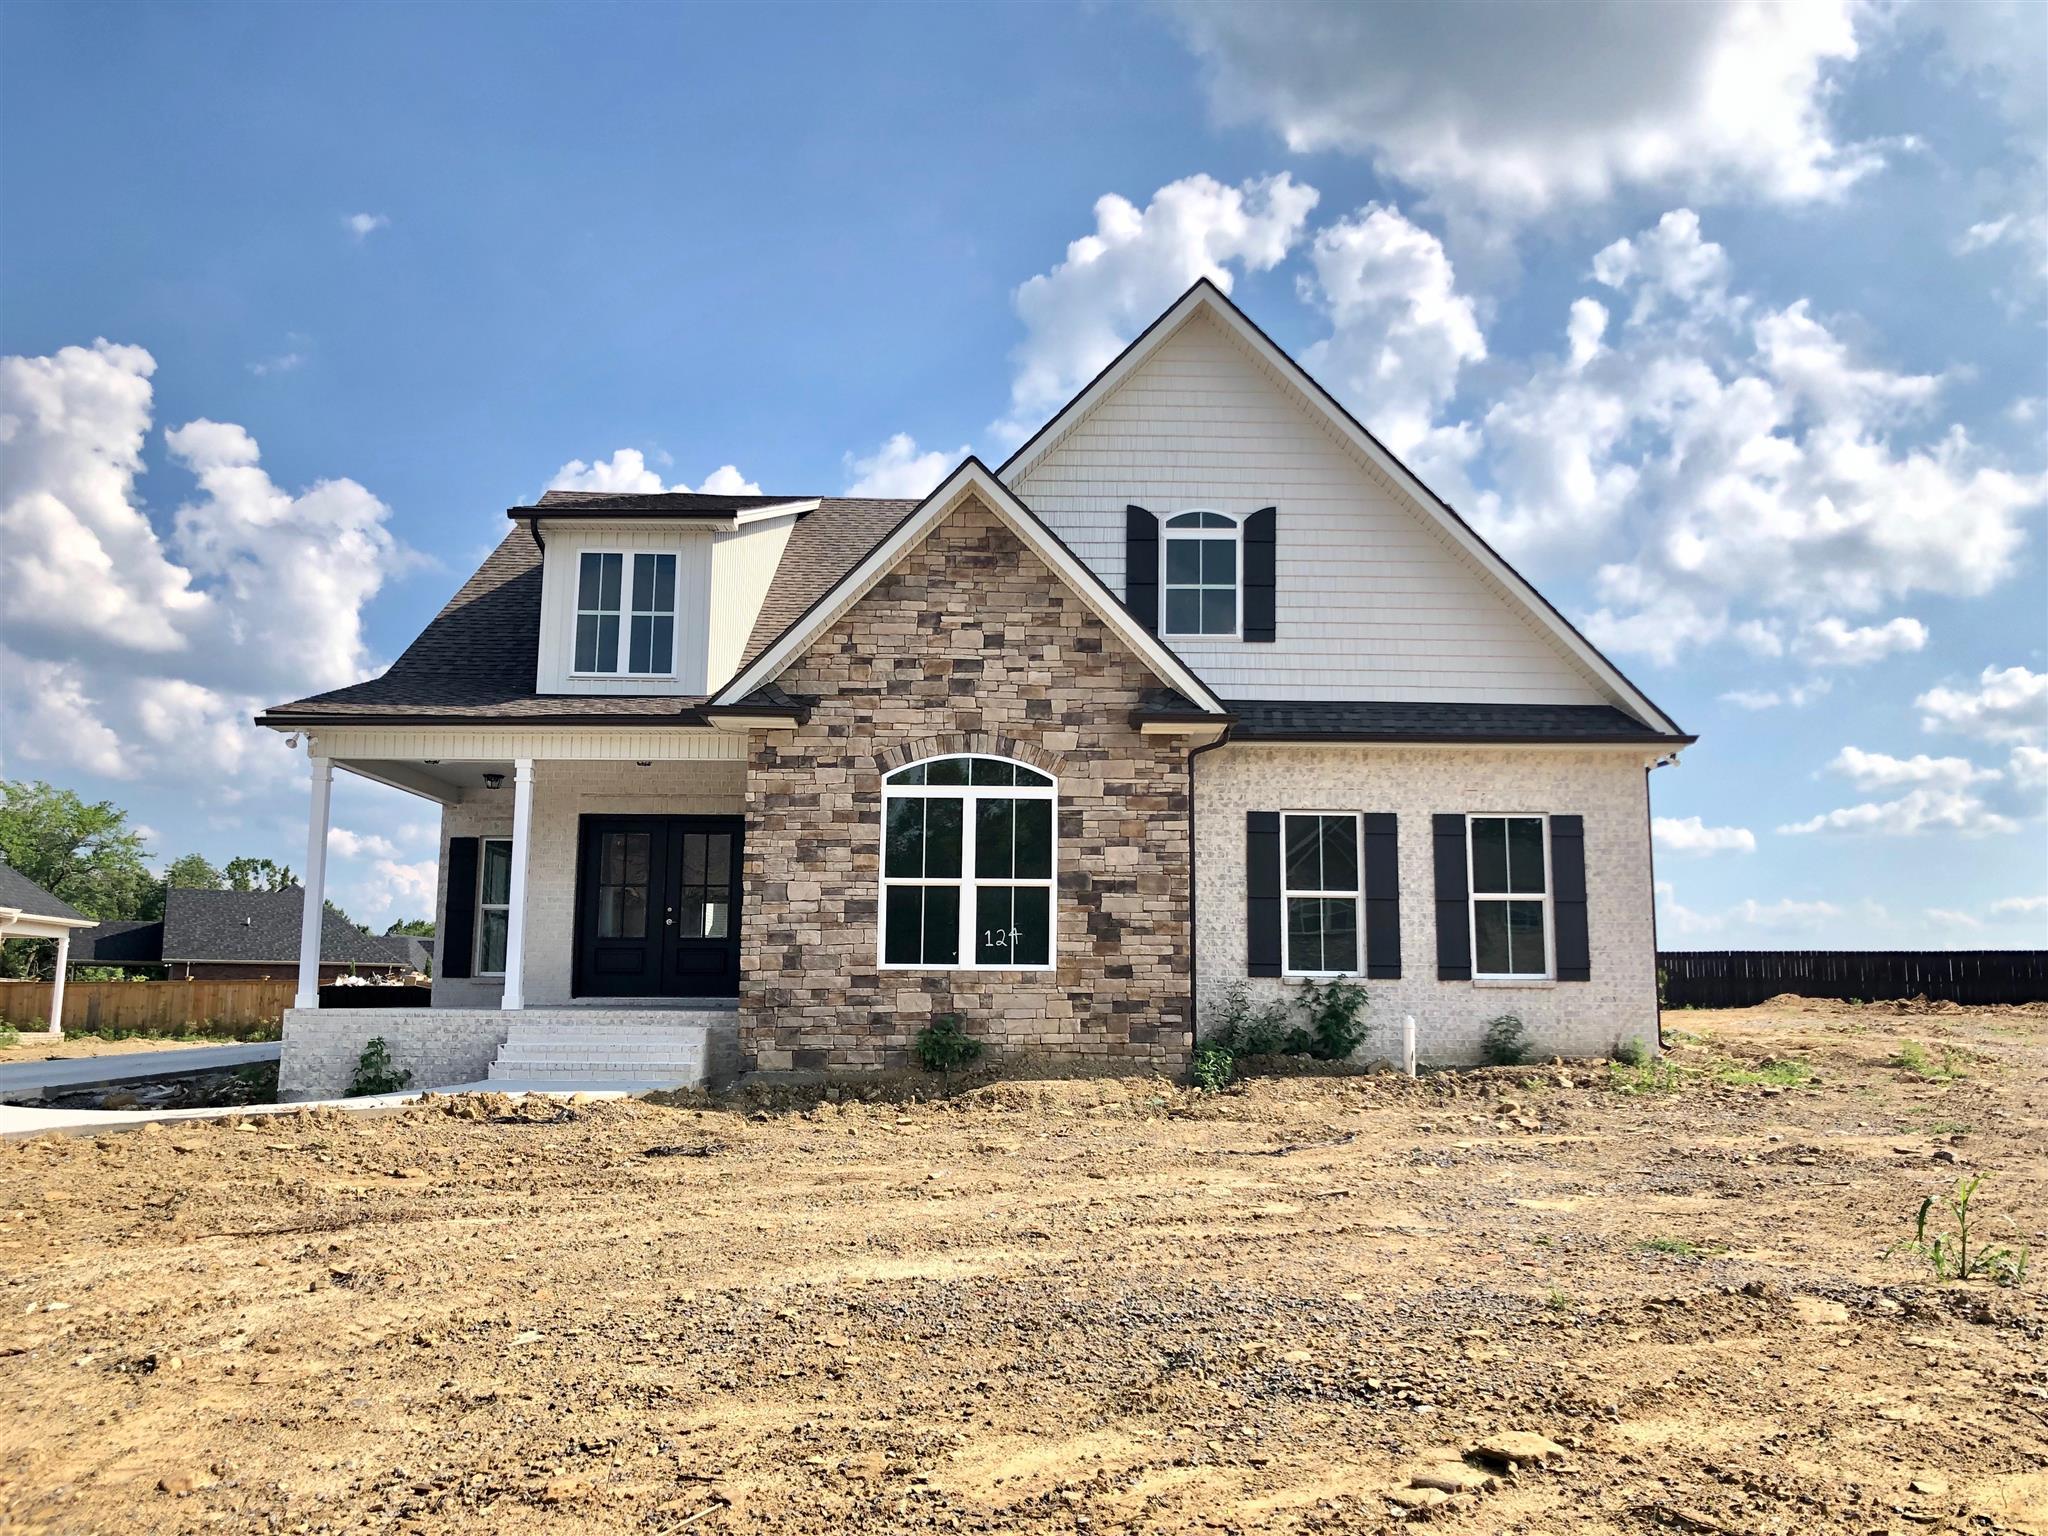 3260 Potts Xing, LA VERGNE, TN 37086 - LA VERGNE, TN real estate listing